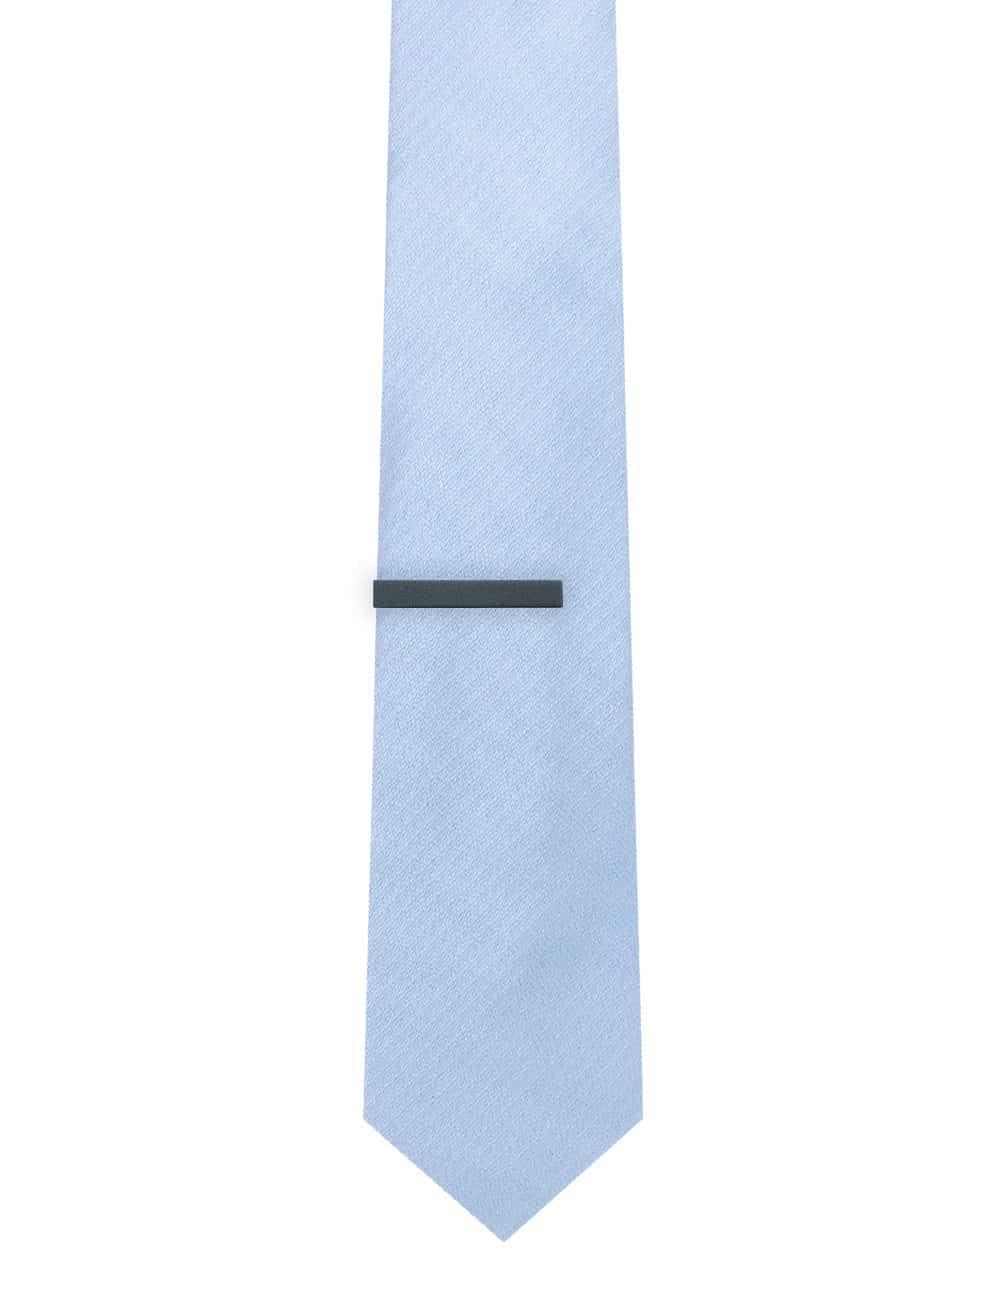 "1.50"" Solid Black Classic Tie Clip TC0101-033B"